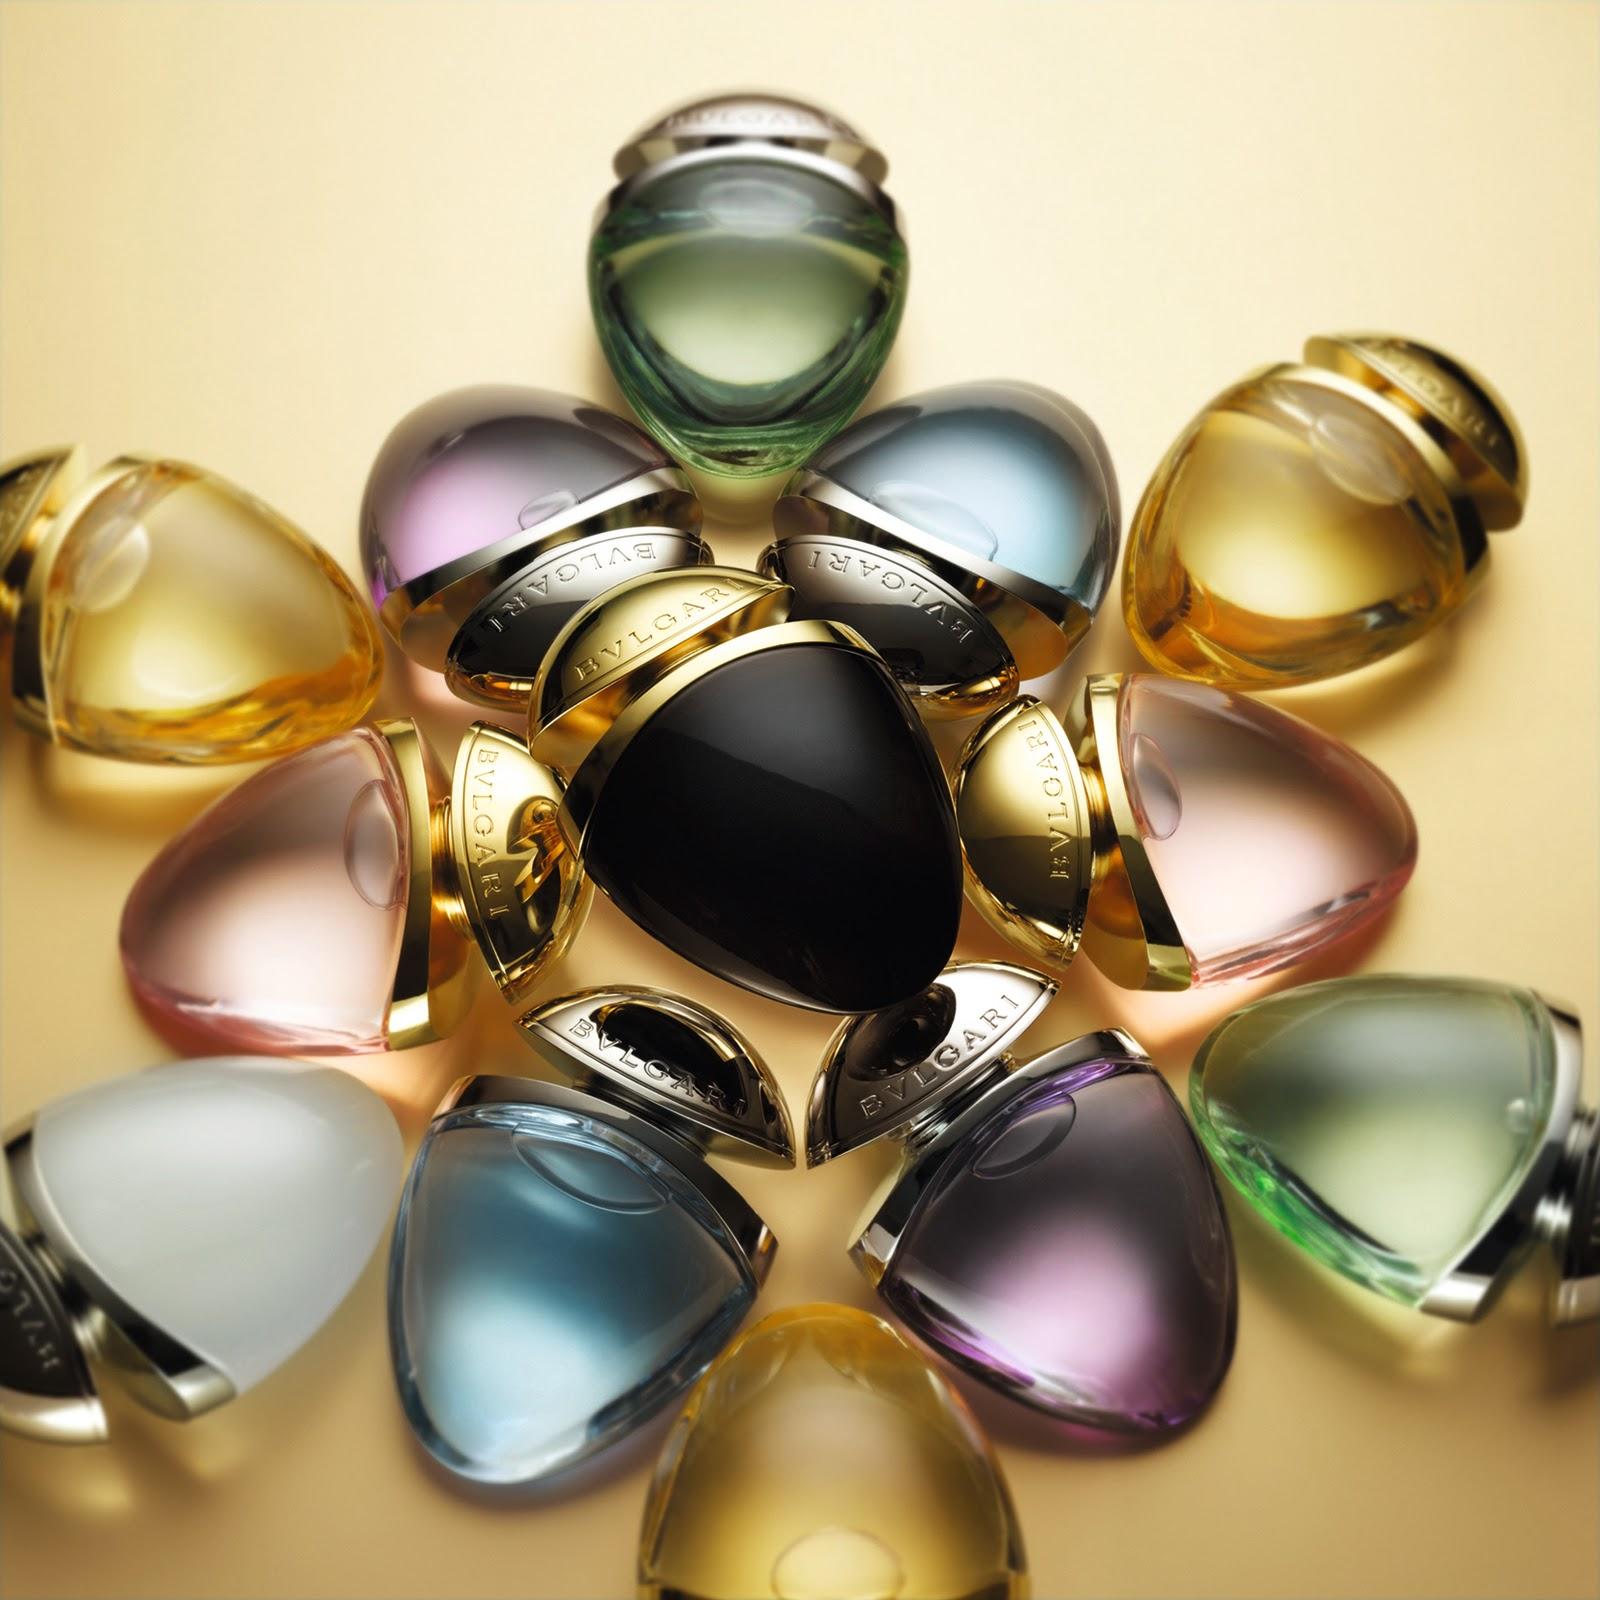 Each charm represents Bvlgari